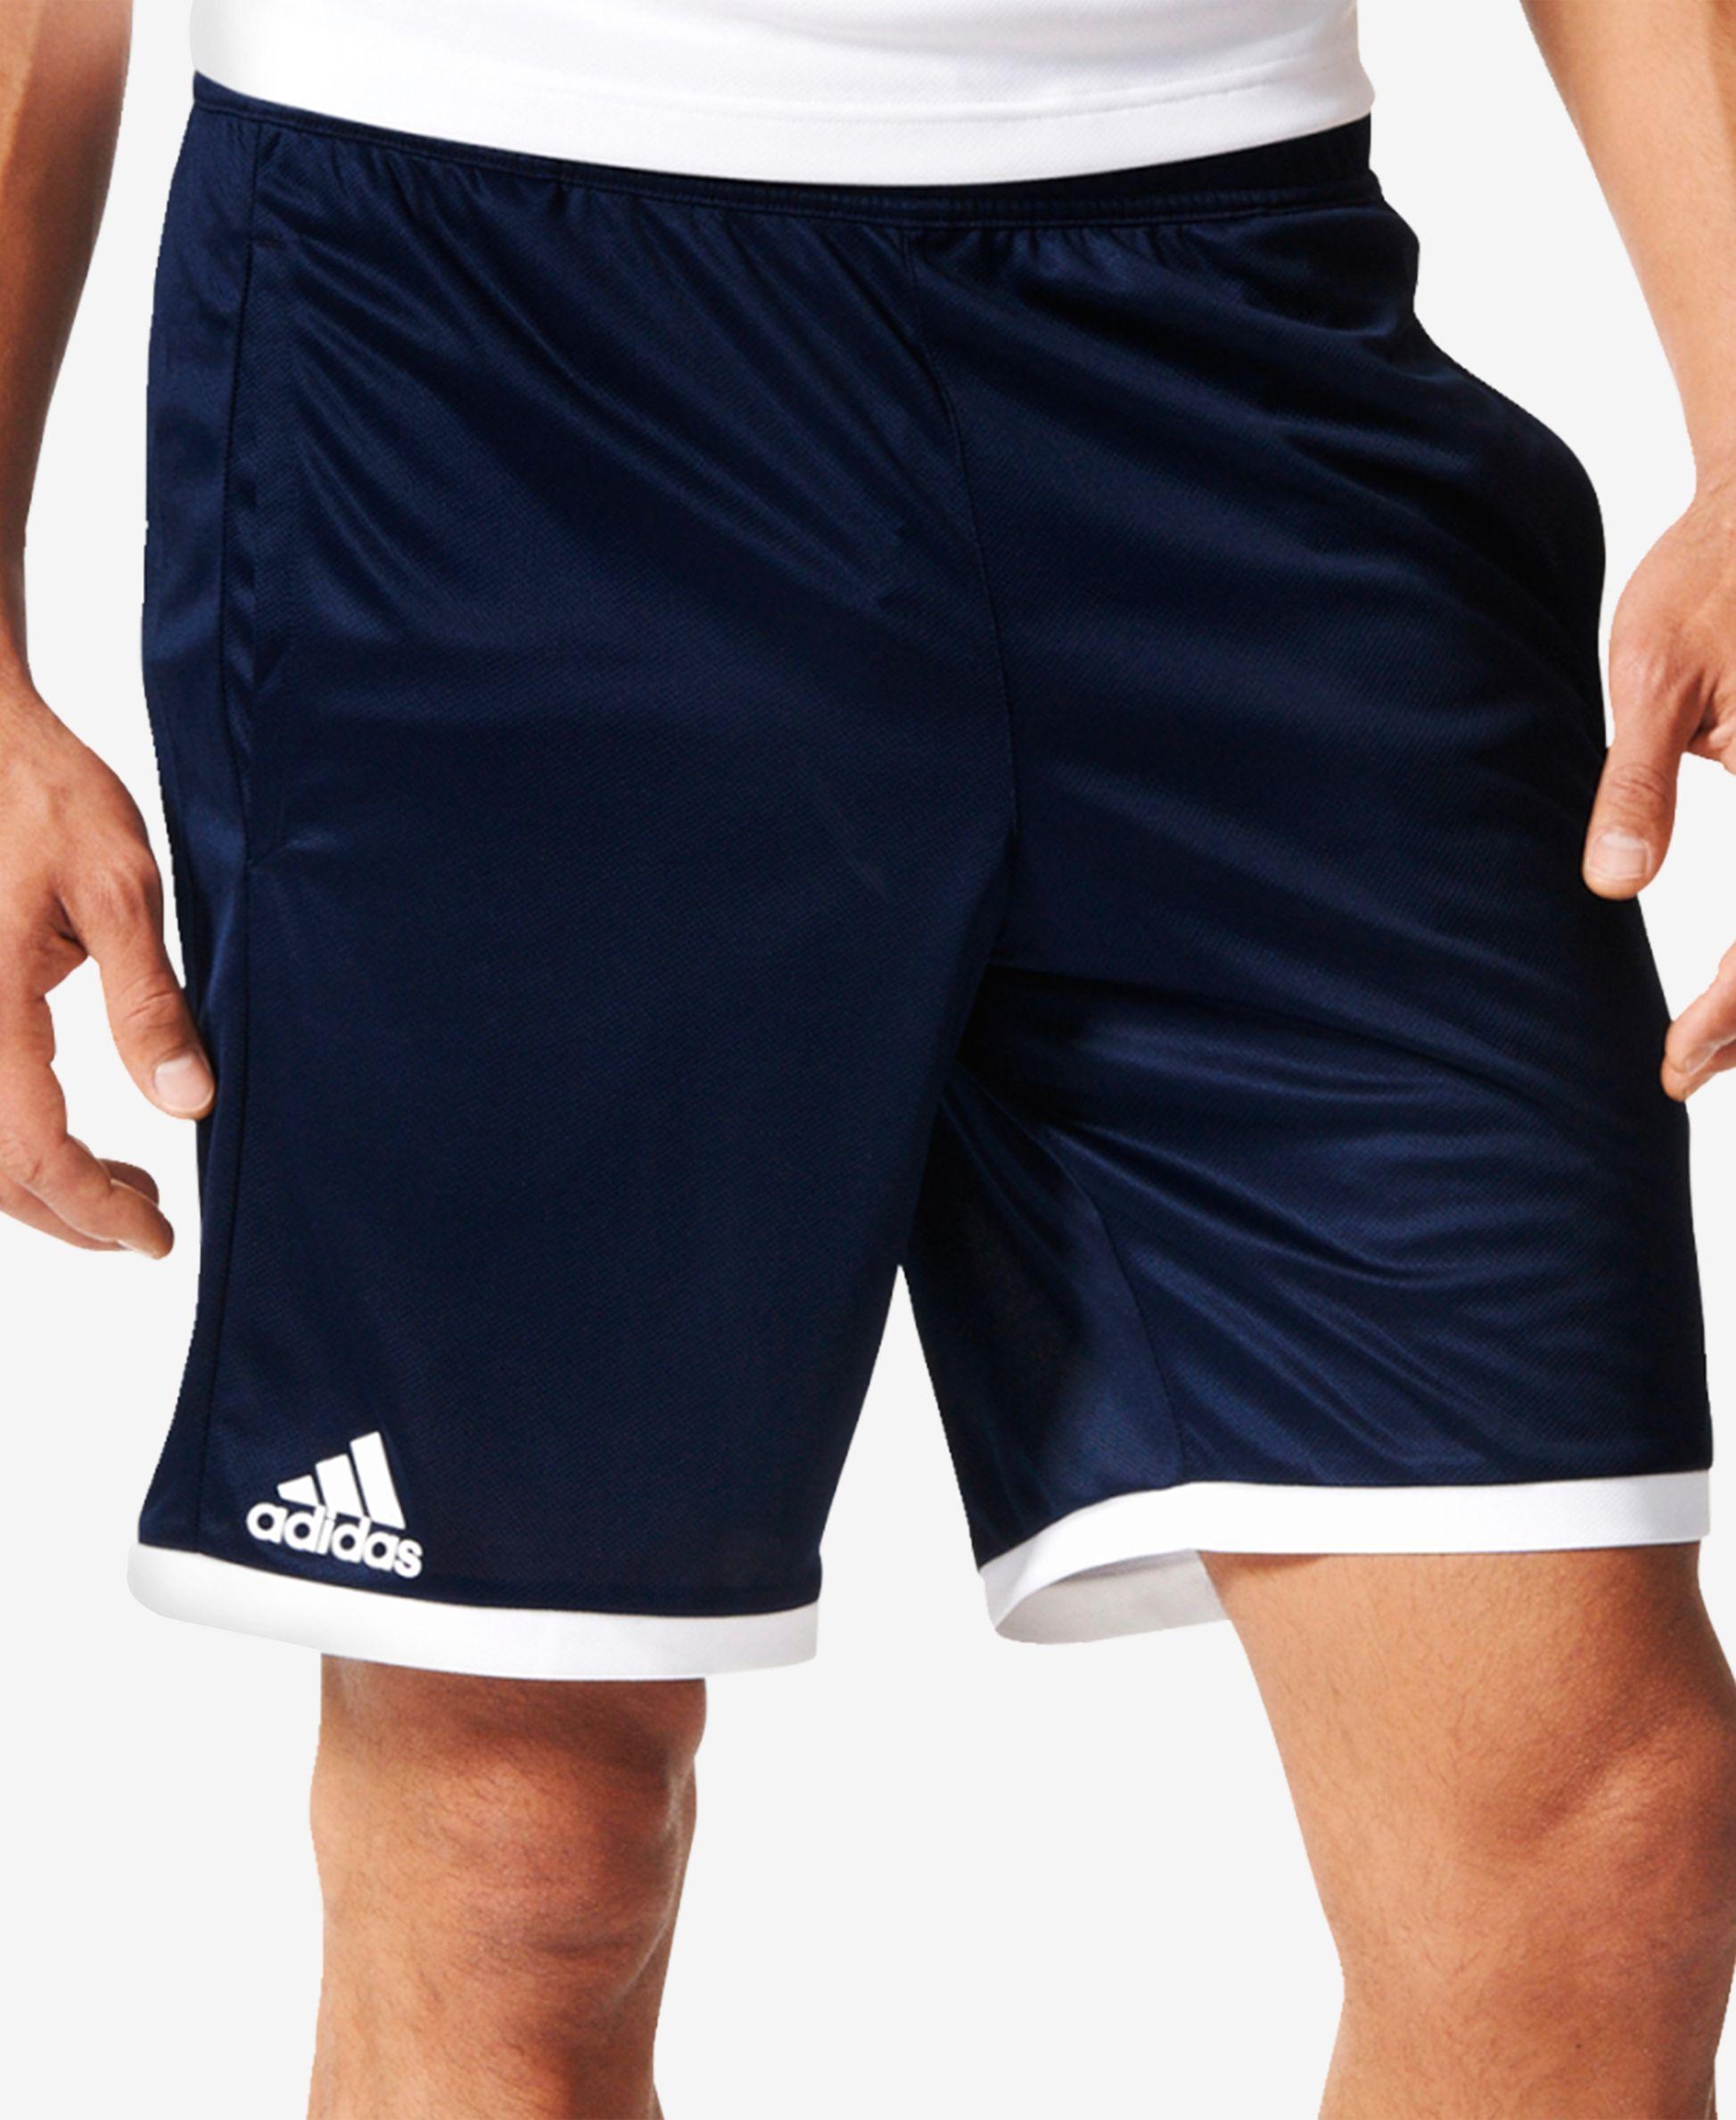 cb6c36ea9594 adidas Men s ClimaLite Tennis Shorts